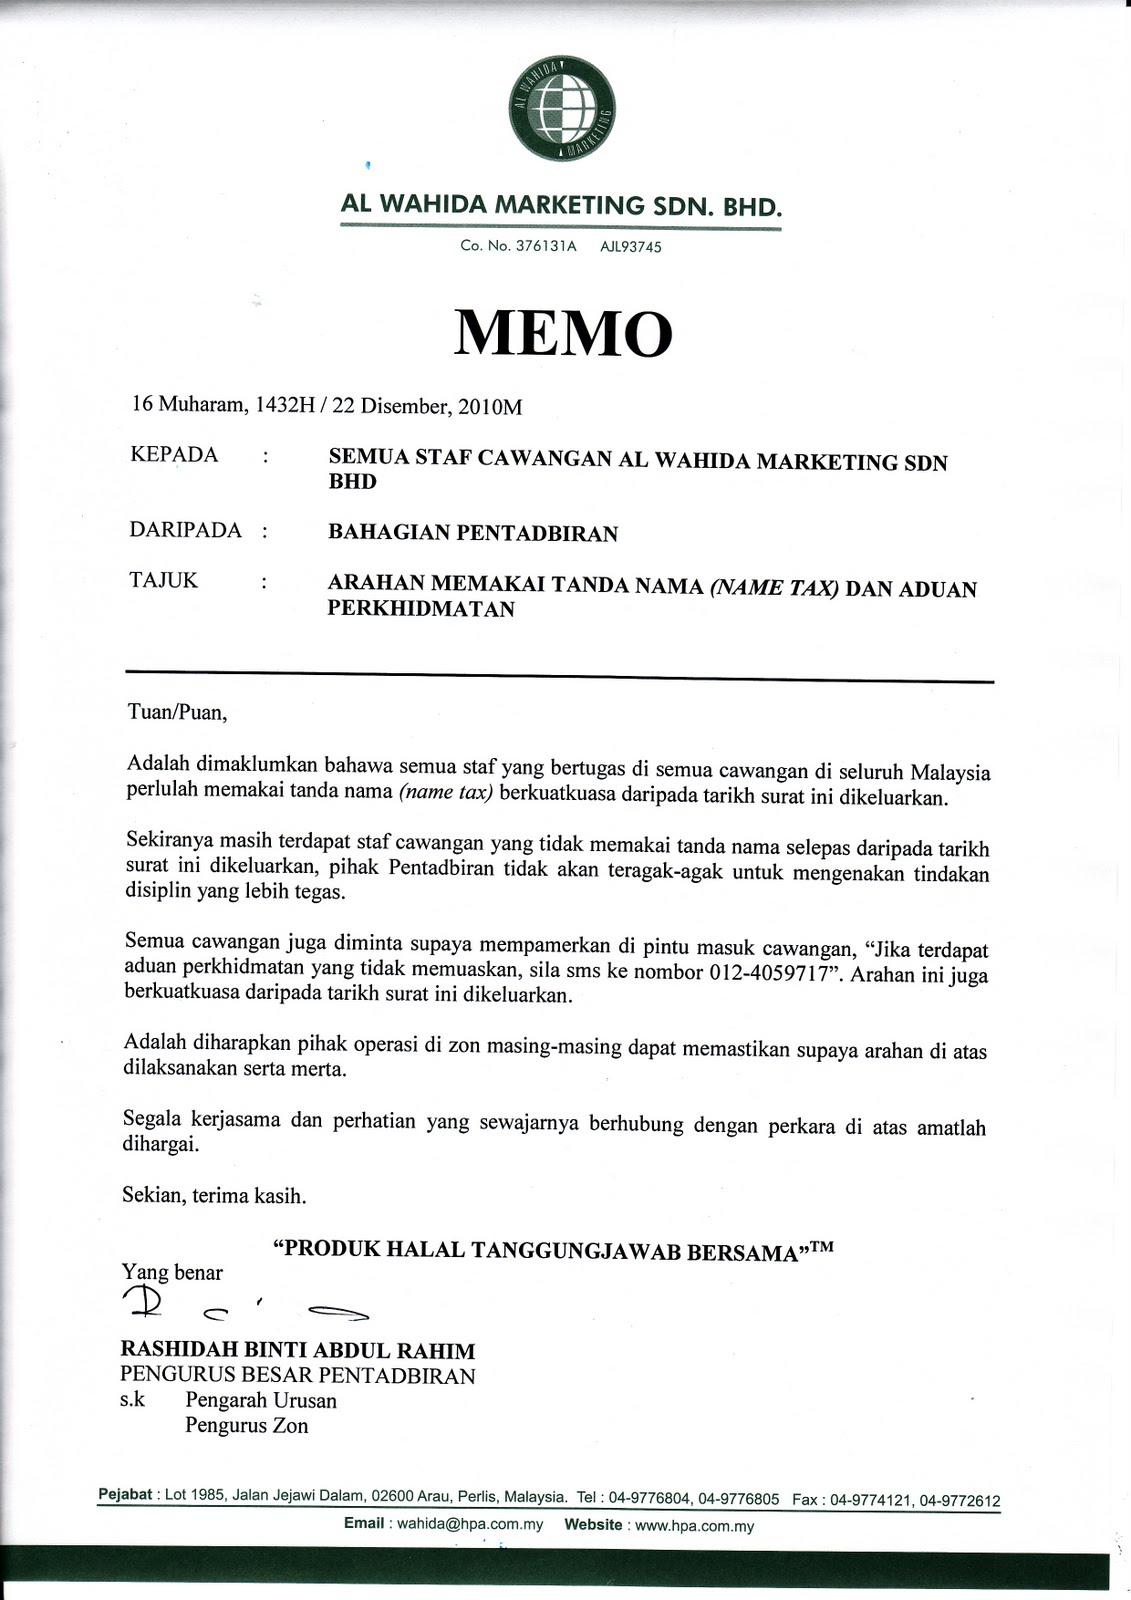 Contoh Surat Resmi Indonesia - Contoh Win